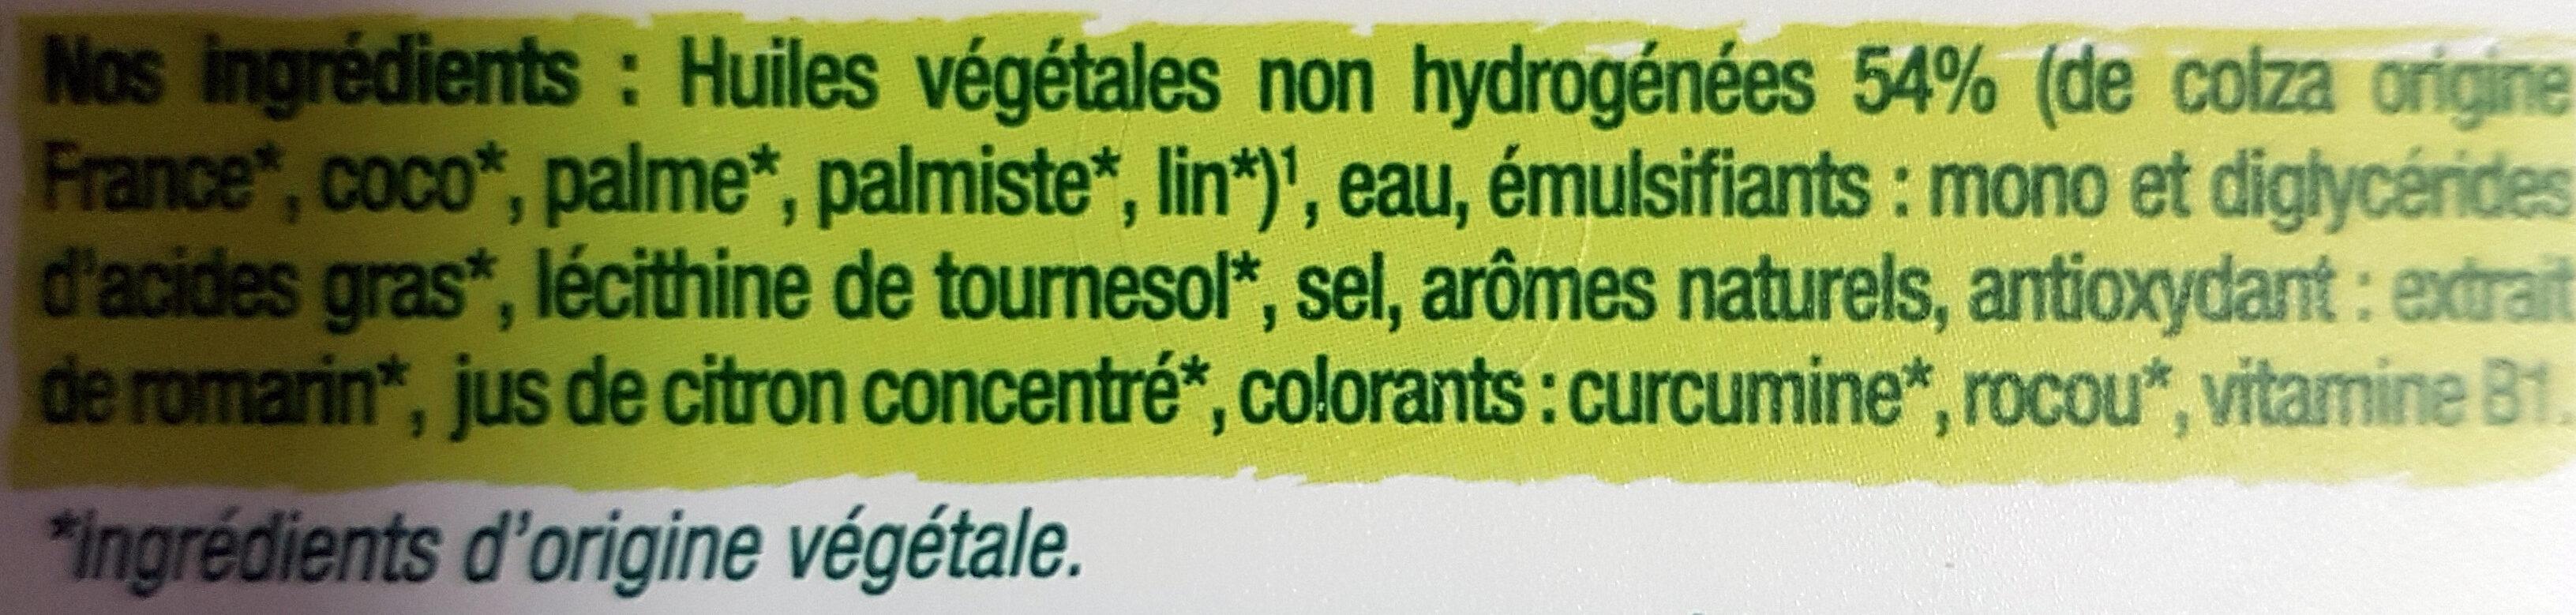 Primevère Tartine doux végétal - Ingredients - fr